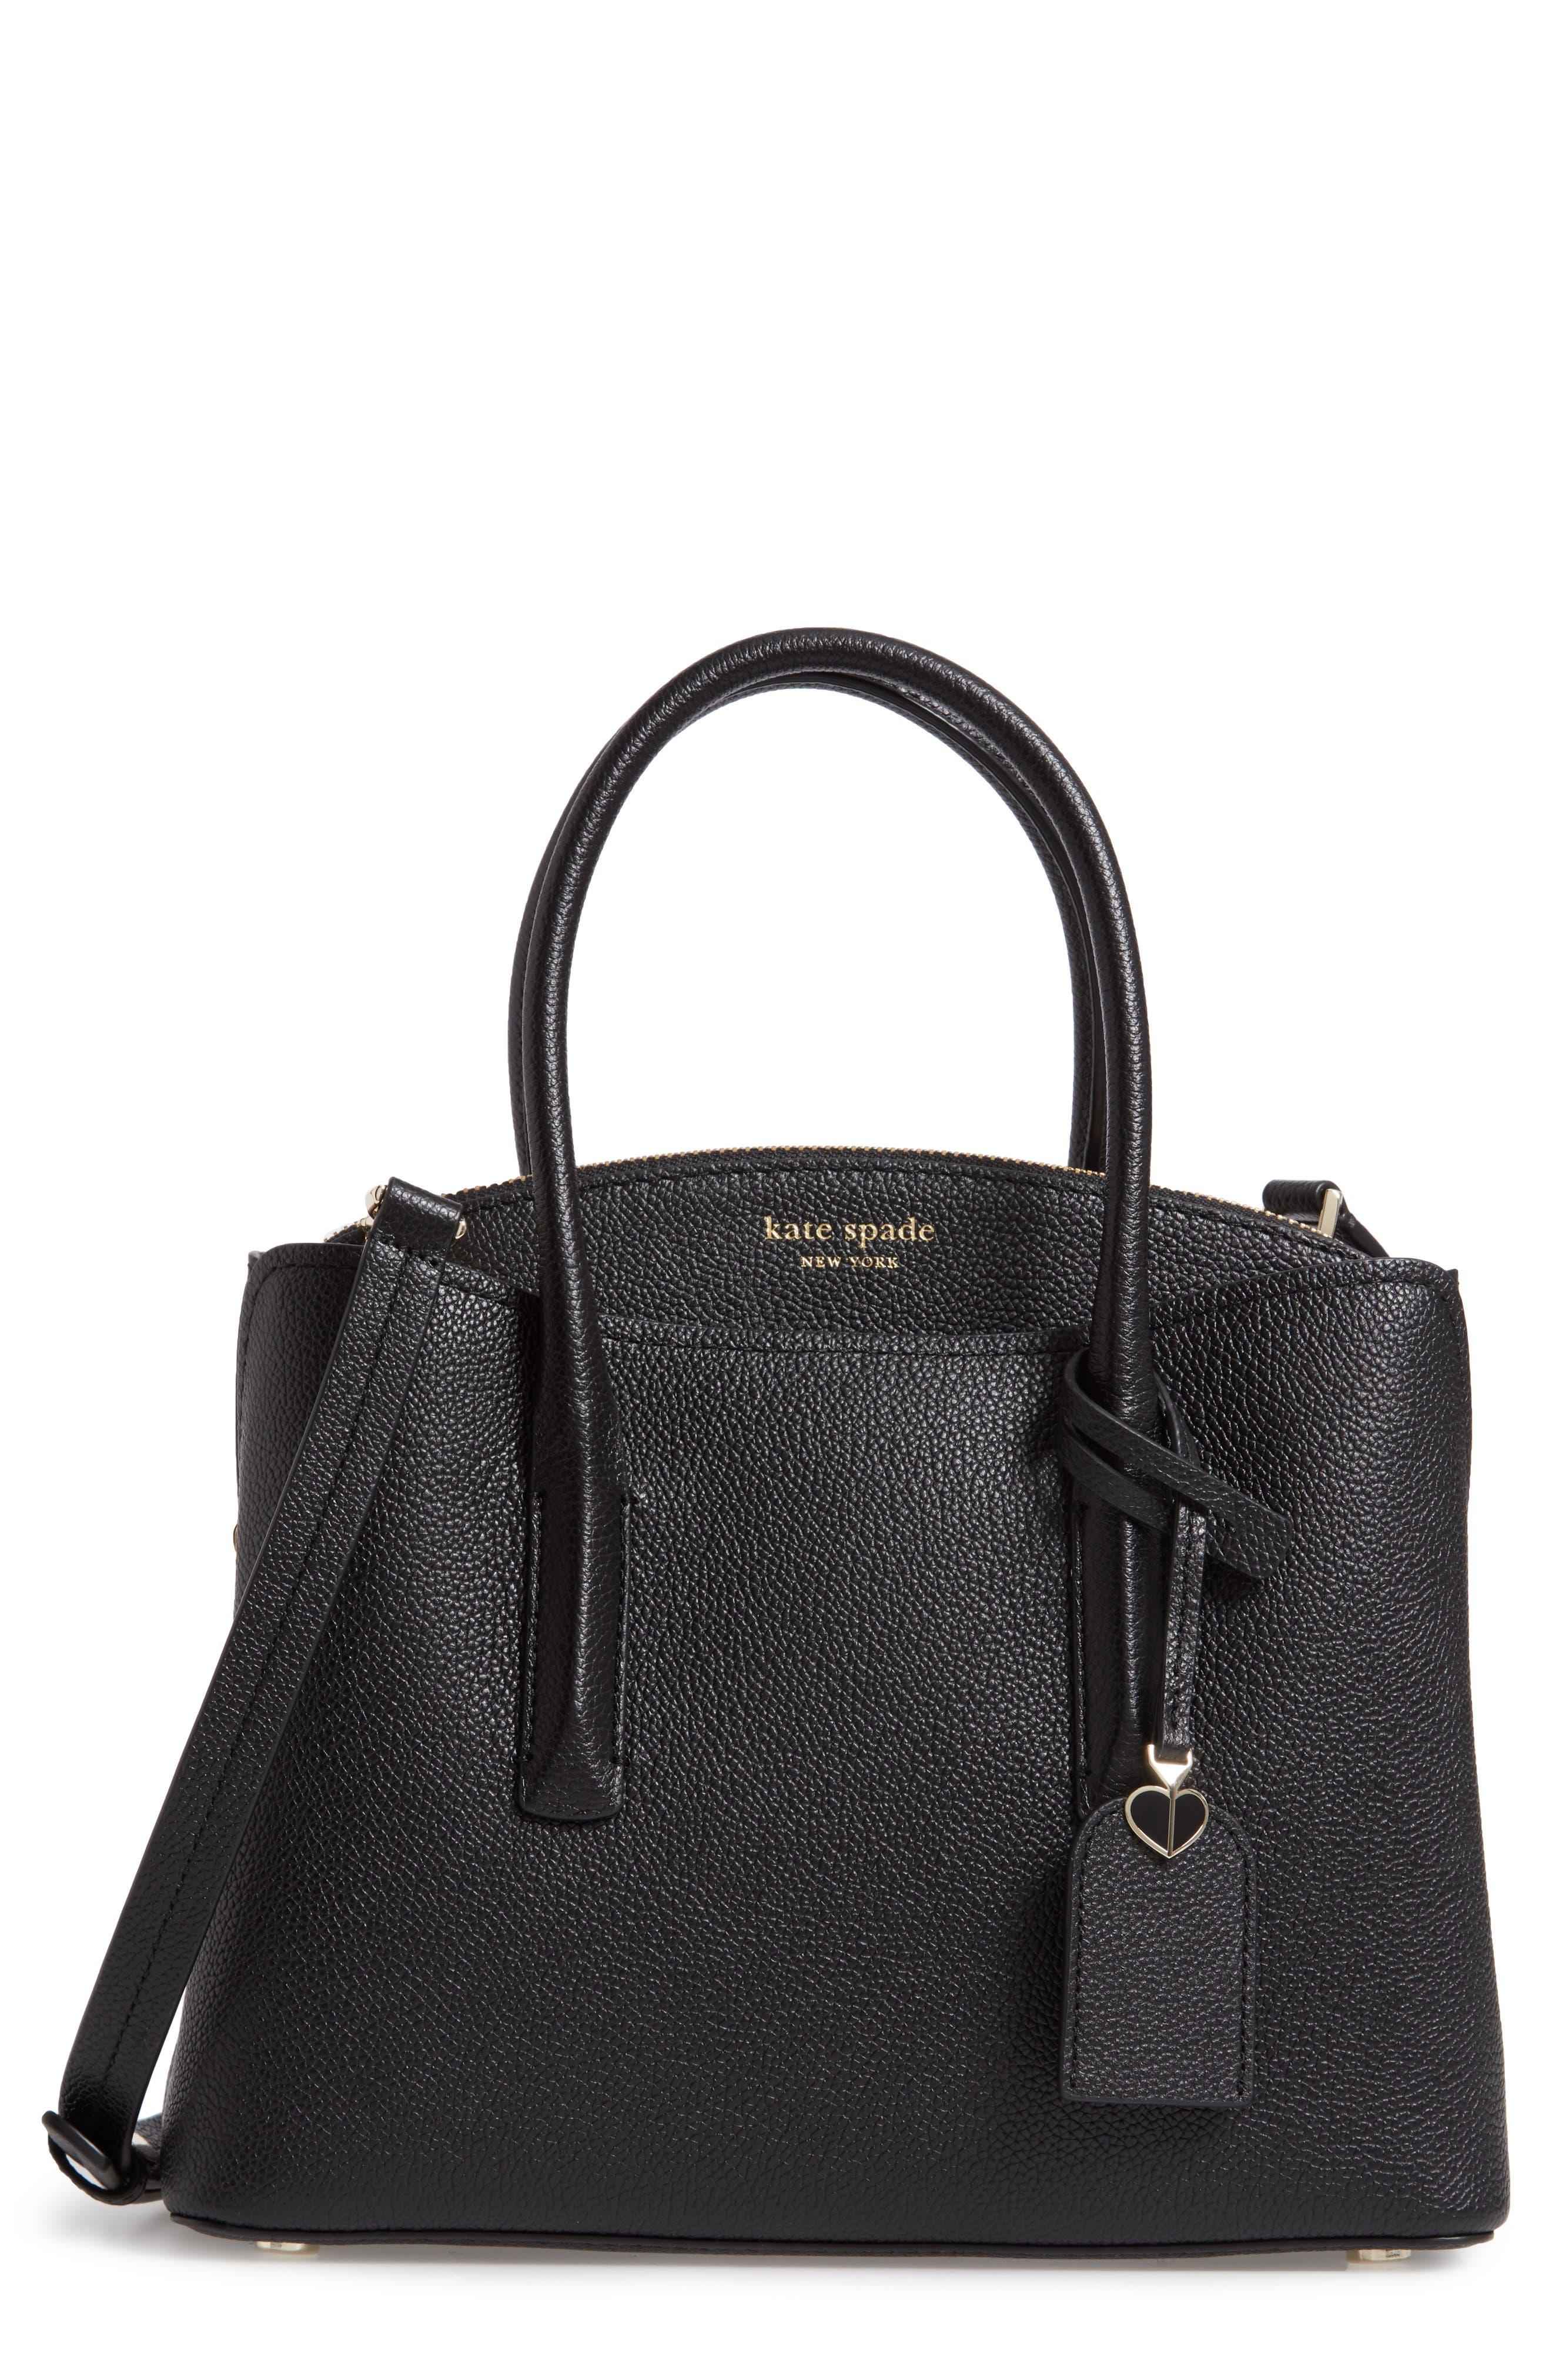 KATE SPADE NEW YORK, medium margaux leather satchel, Main thumbnail 1, color, BLACK